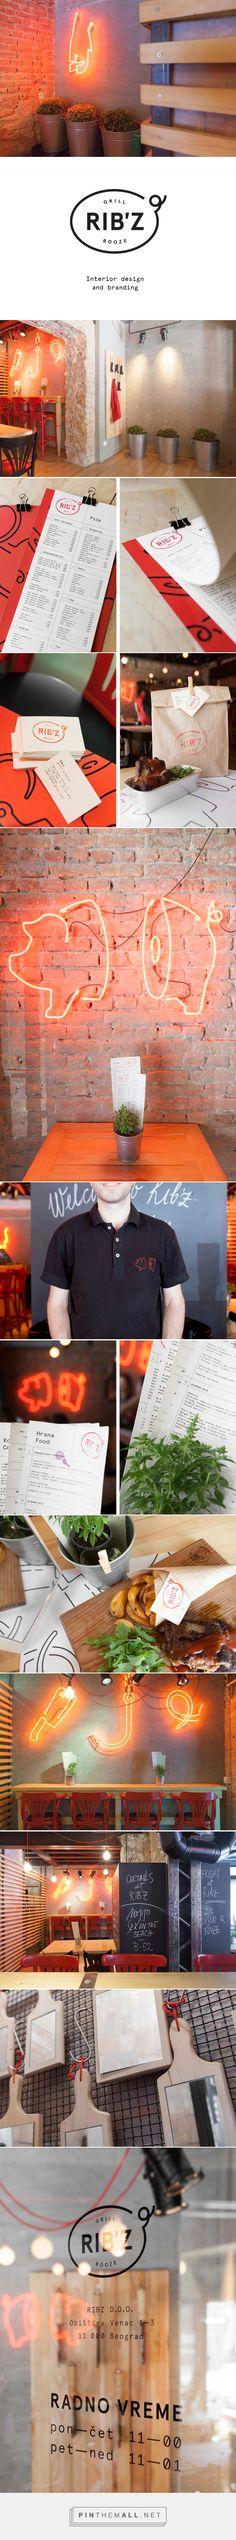 RIB'Z Grill 'n' Booze by Milena Savić